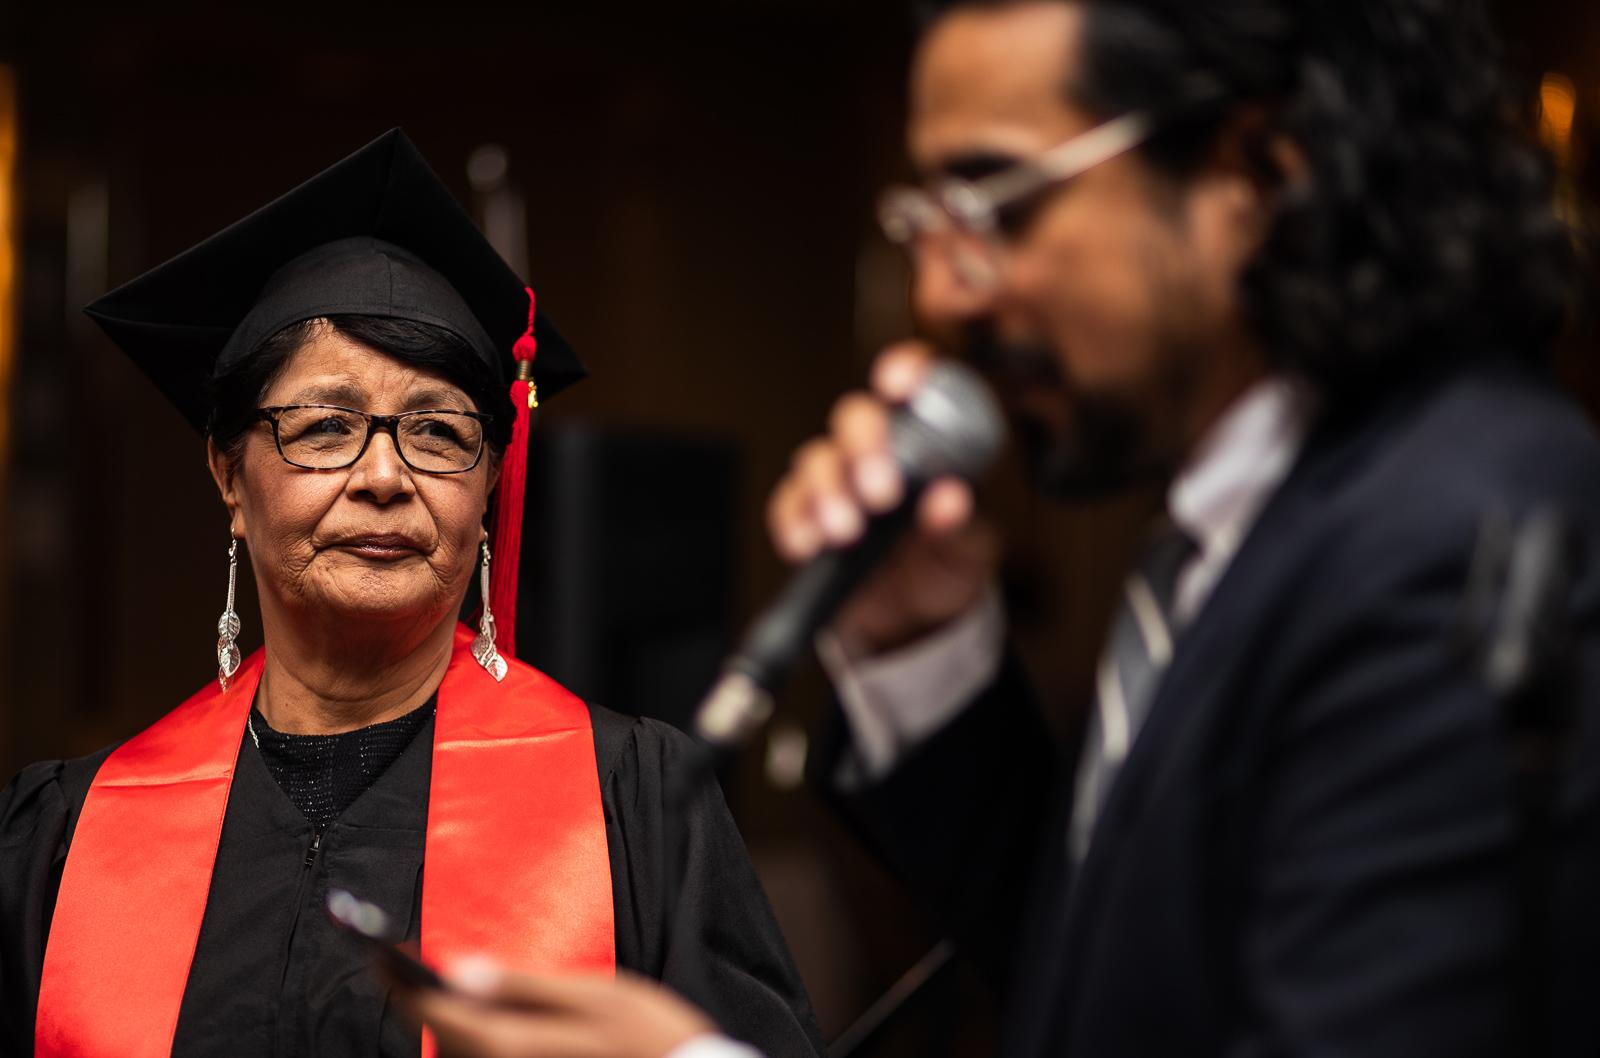 kihs-graduation-2019-fb-19.jpg